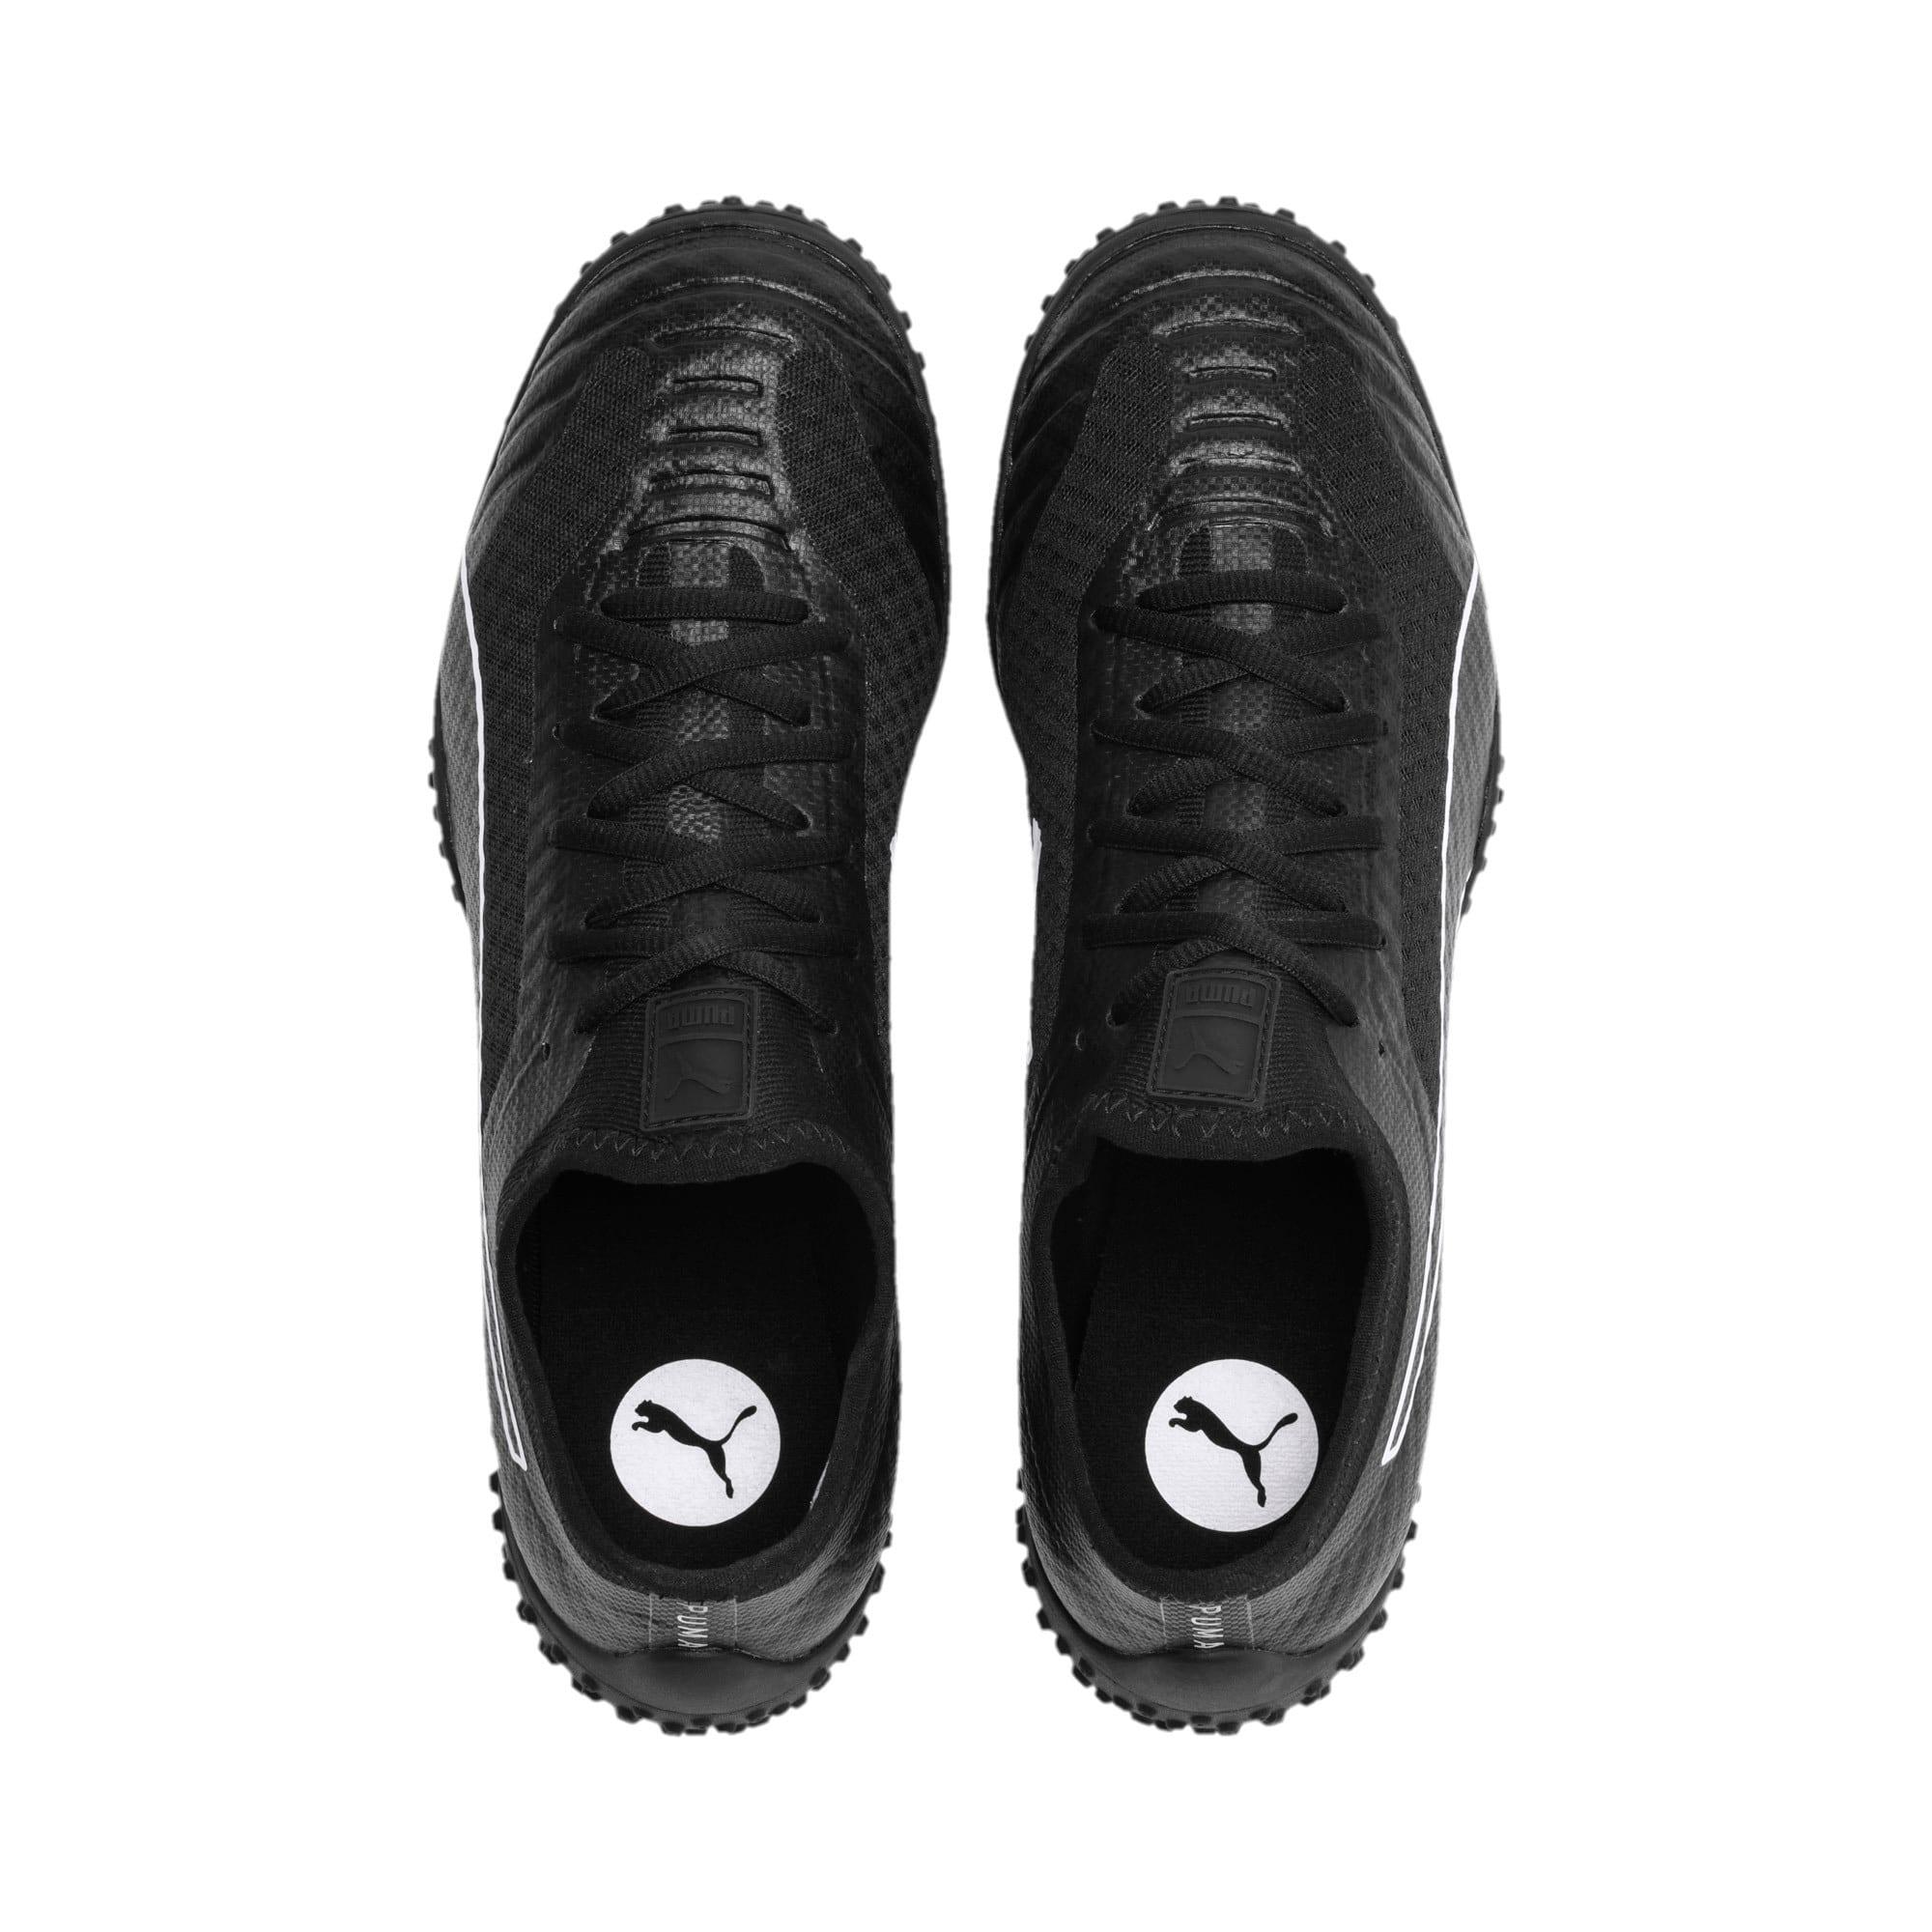 Thumbnail 7 of 365 Concrete 2 Men's Football Boots, Puma Black-Puma White, medium